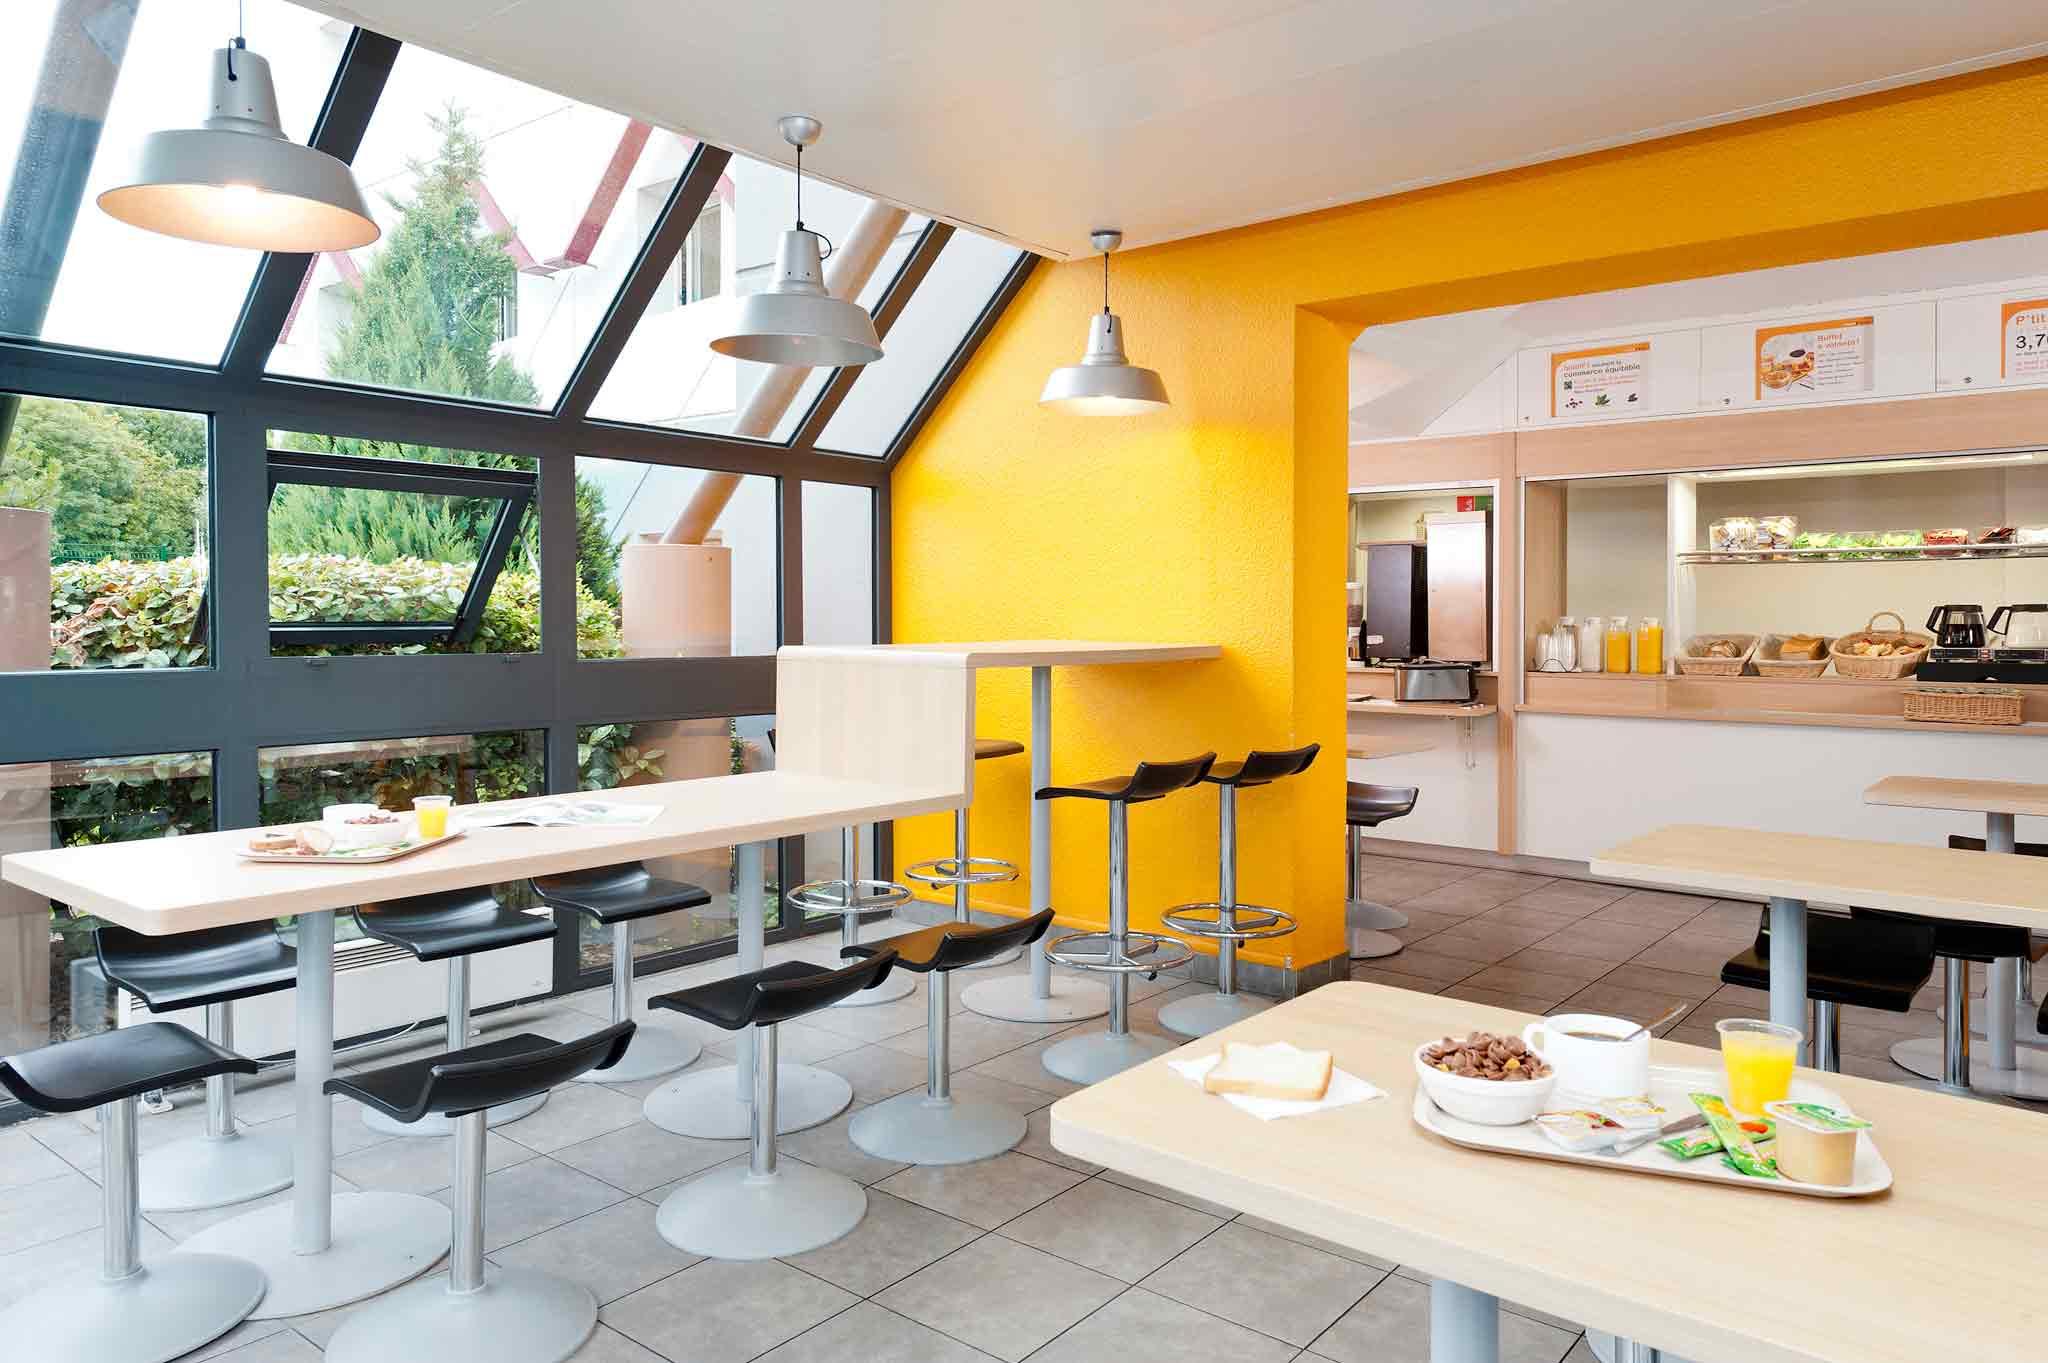 hotel in montgermont hotelf1 rennes nord montgermont. Black Bedroom Furniture Sets. Home Design Ideas